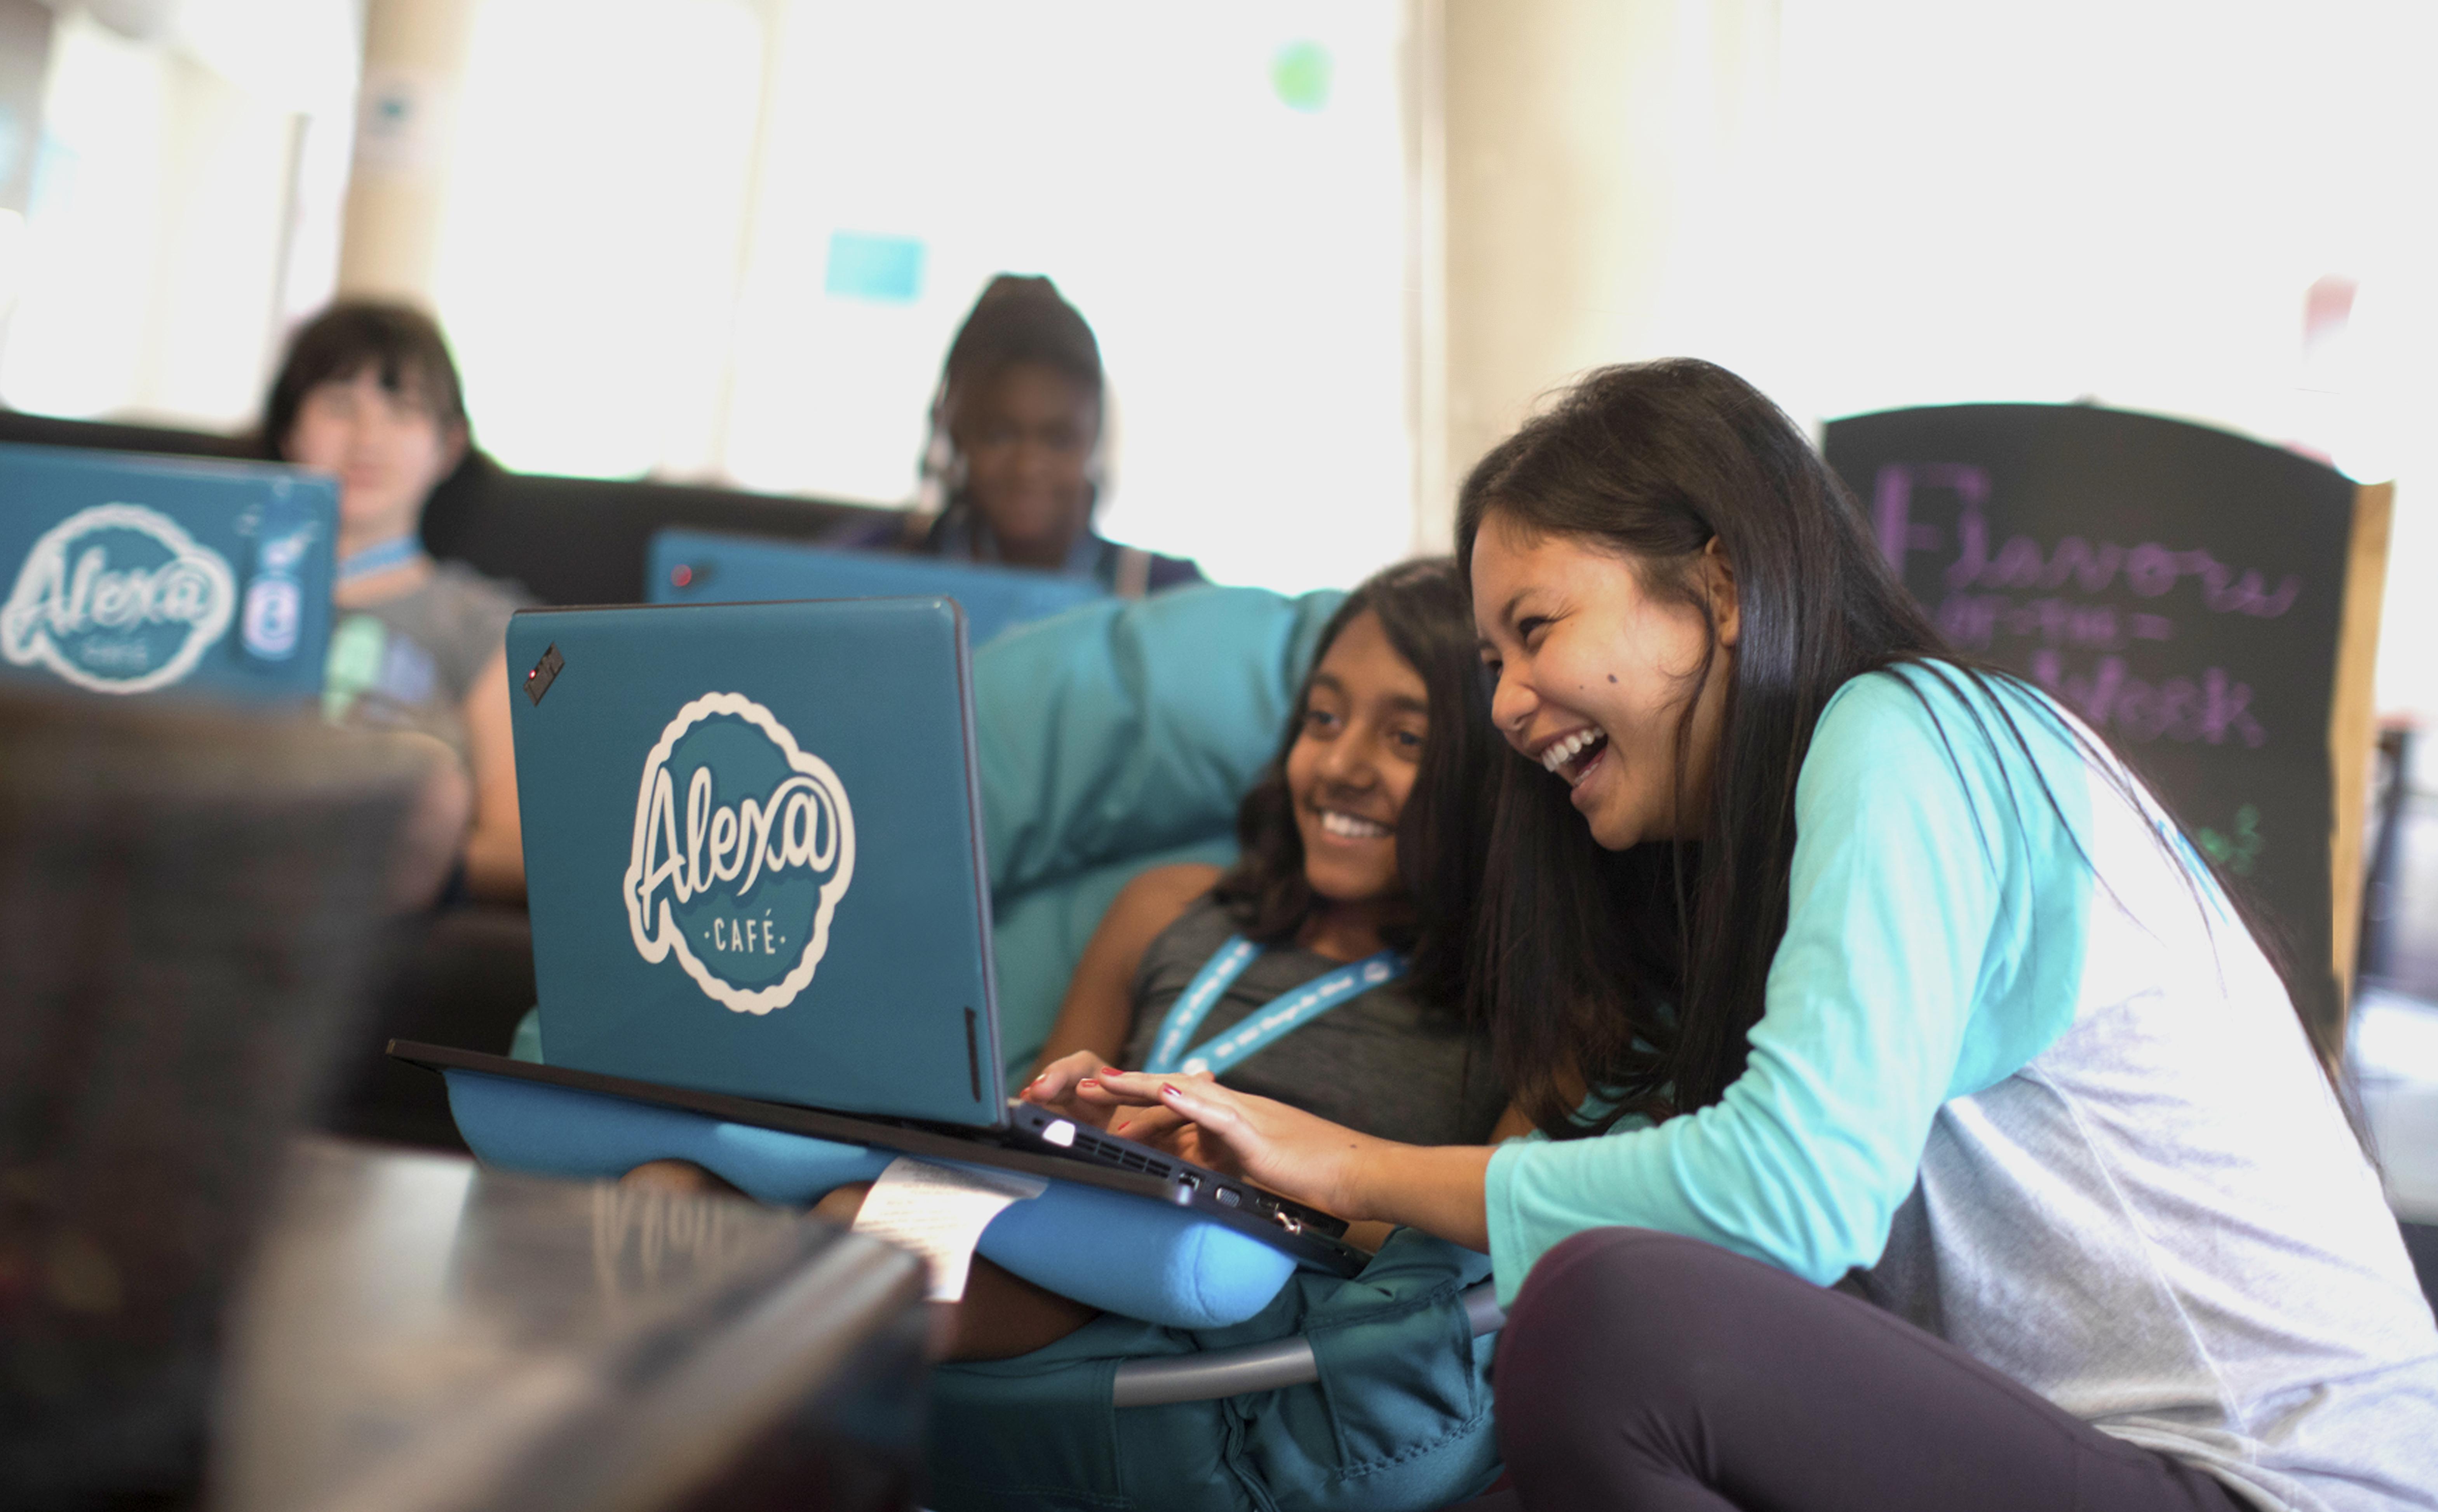 Summer Program - Video Gaming | Alexa Cafe: All-Girls STEM Camp | Held at Macalester College